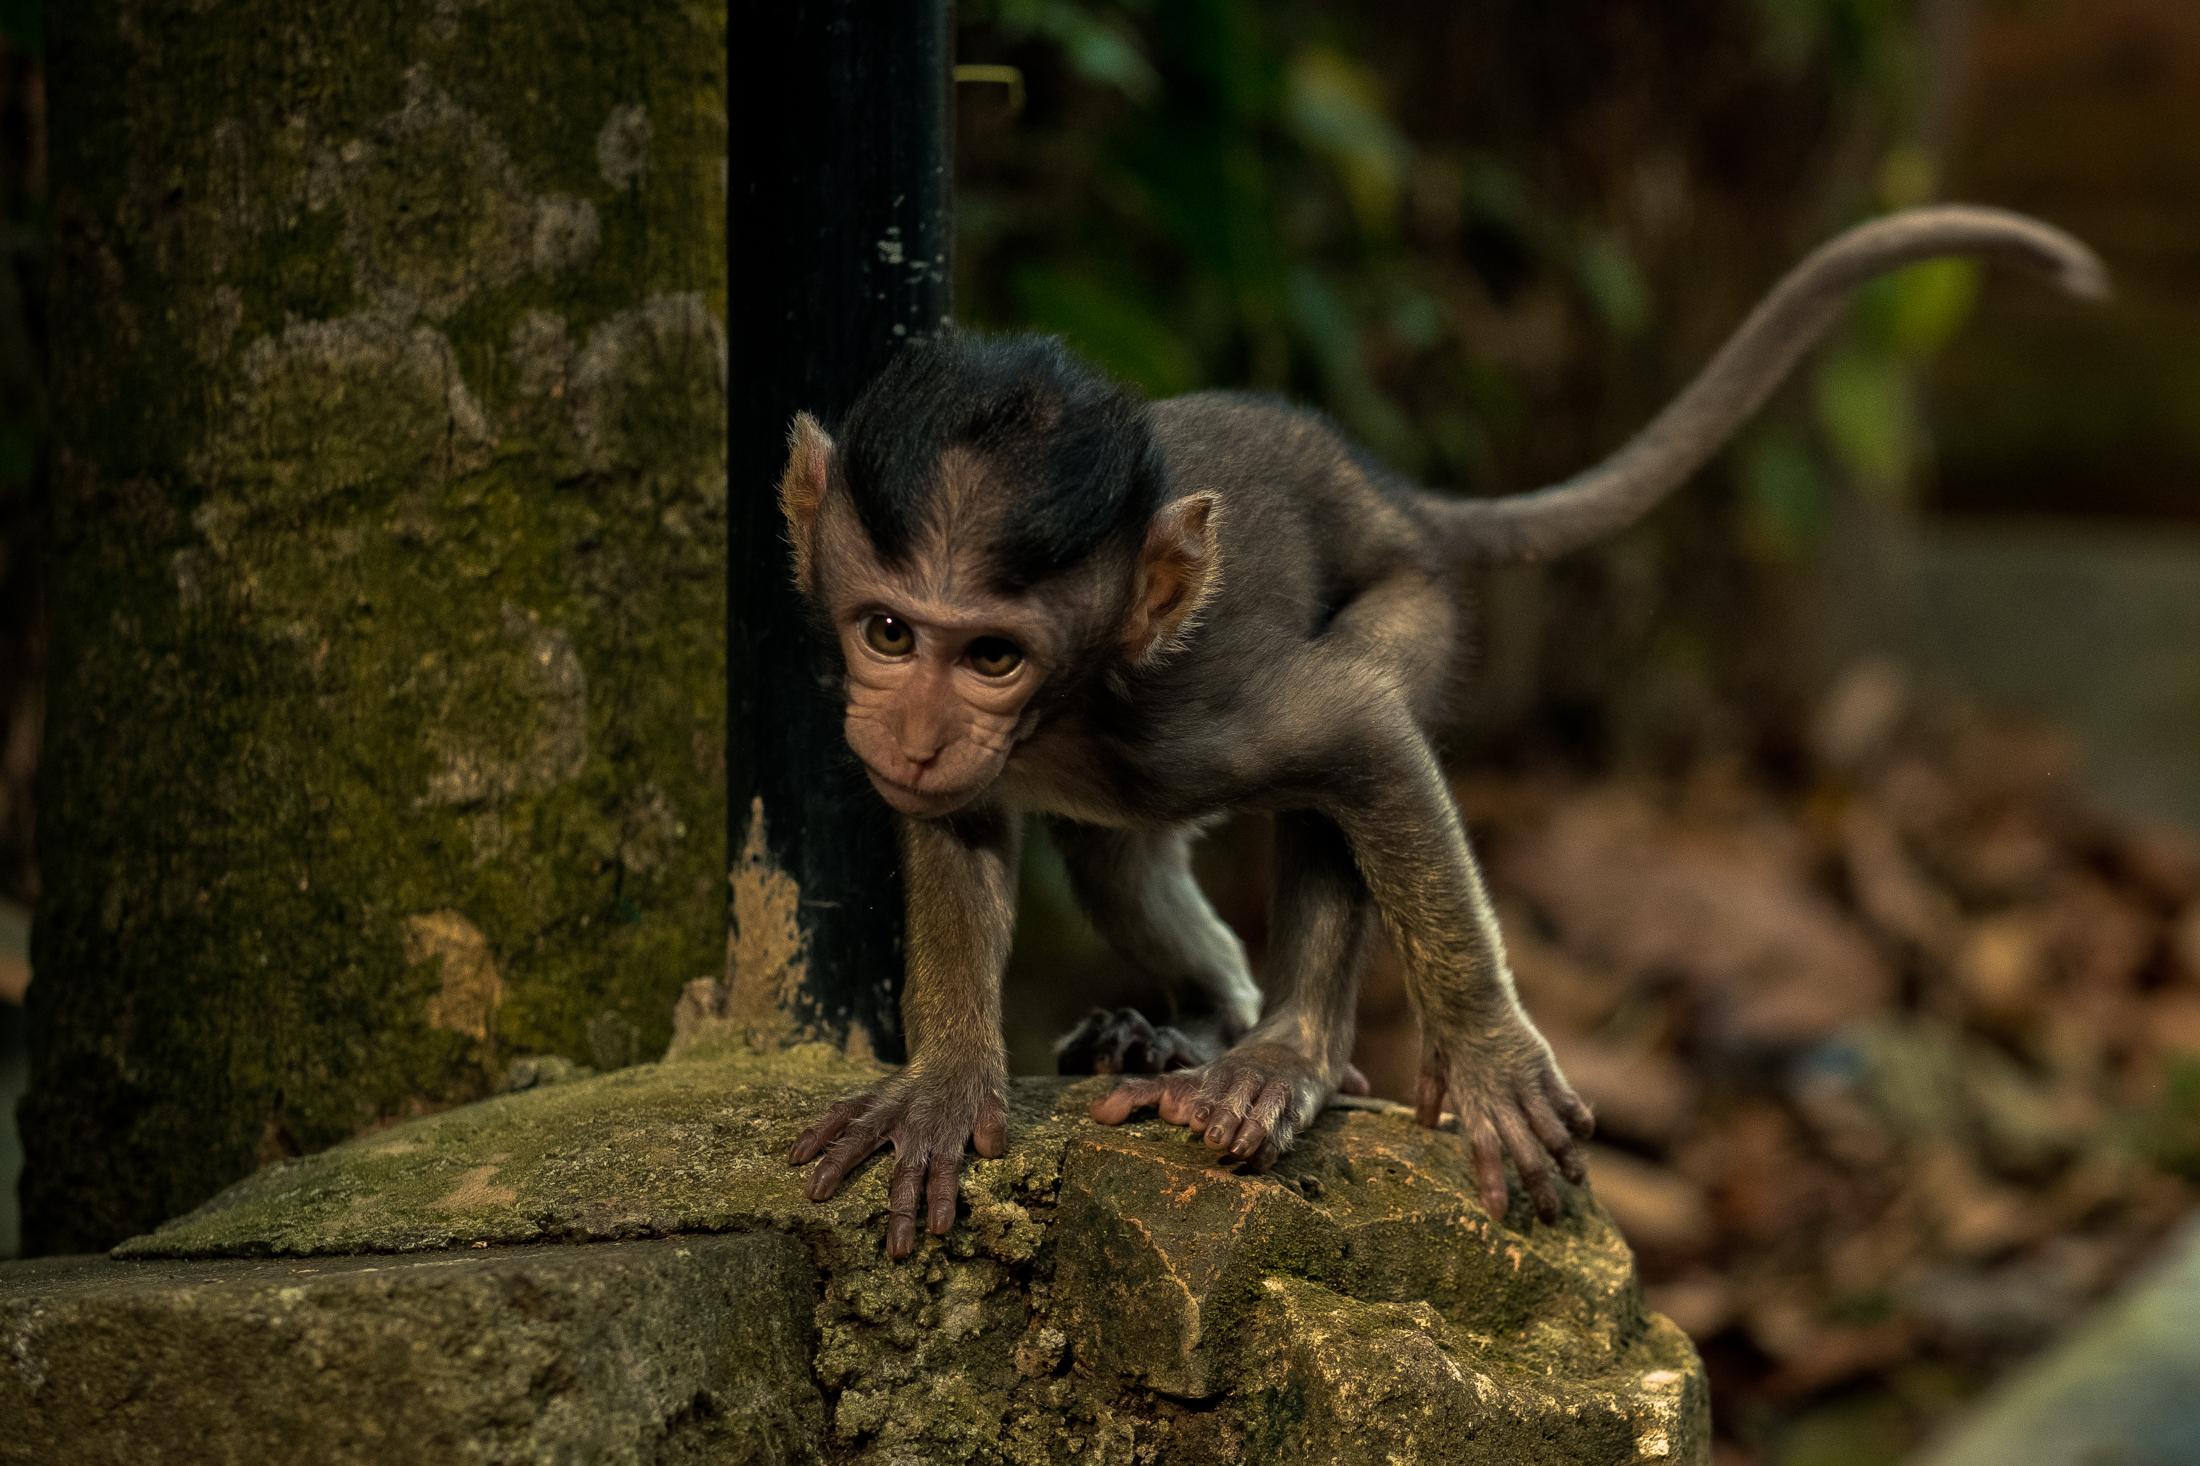 bali_day9_monkey-26.jpg